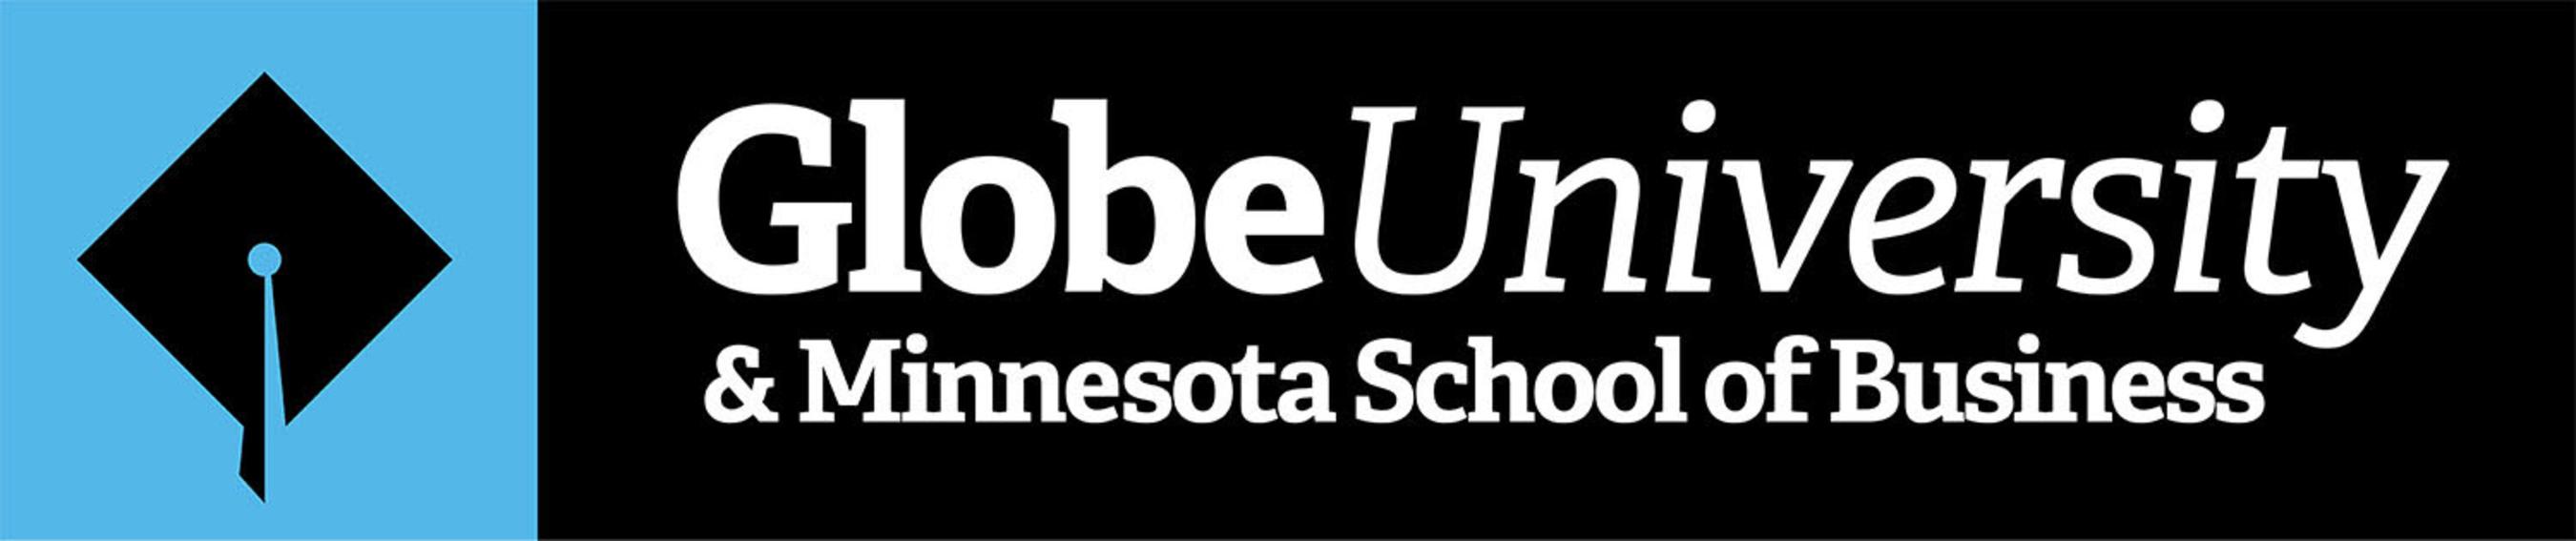 Globe University and Minnesota School of Business